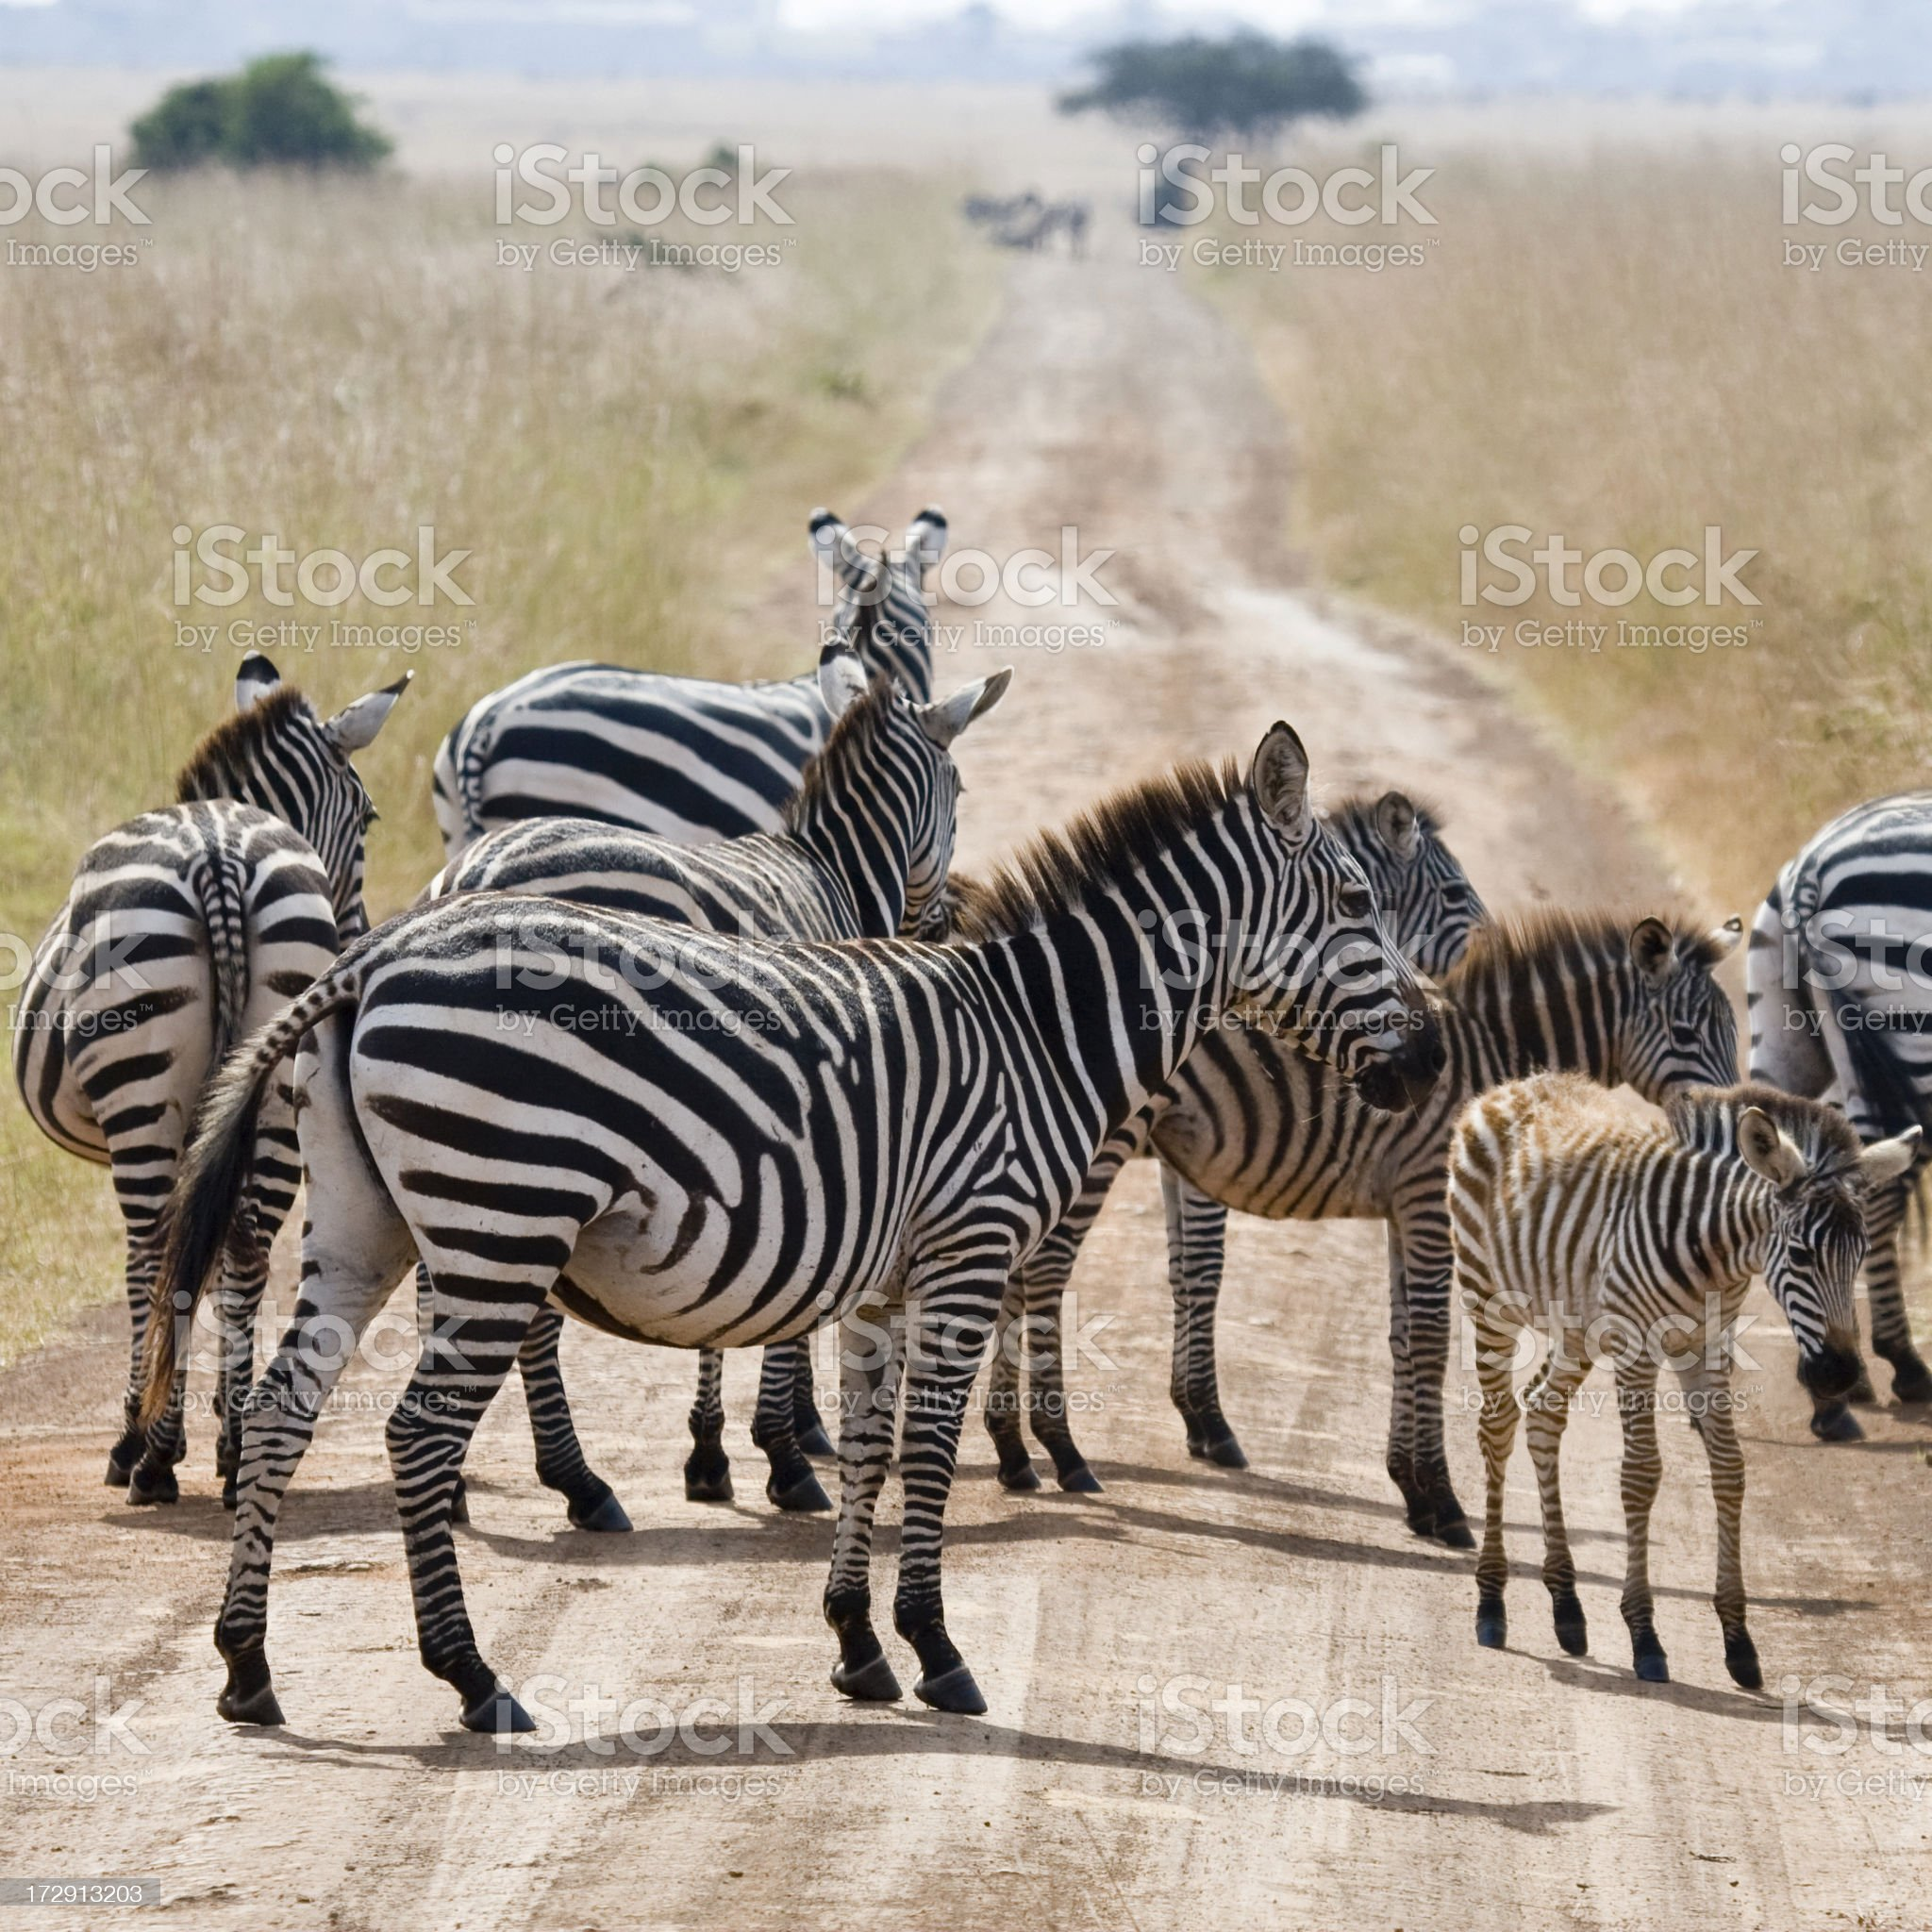 Zebras in Kenya royalty-free stock photo